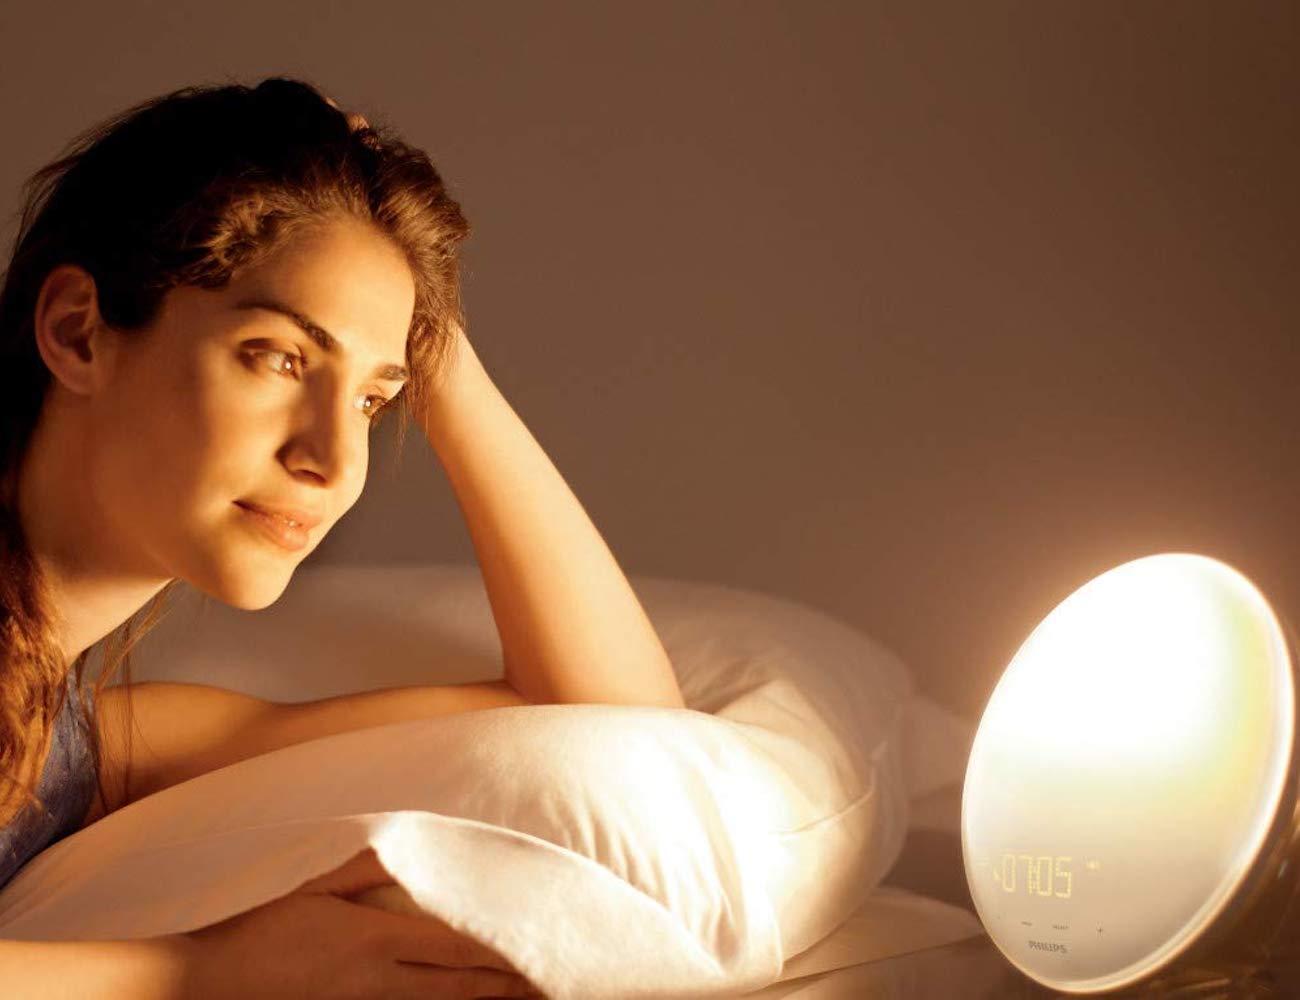 Philips HF3520 Wake-Up Light Alarm Clock